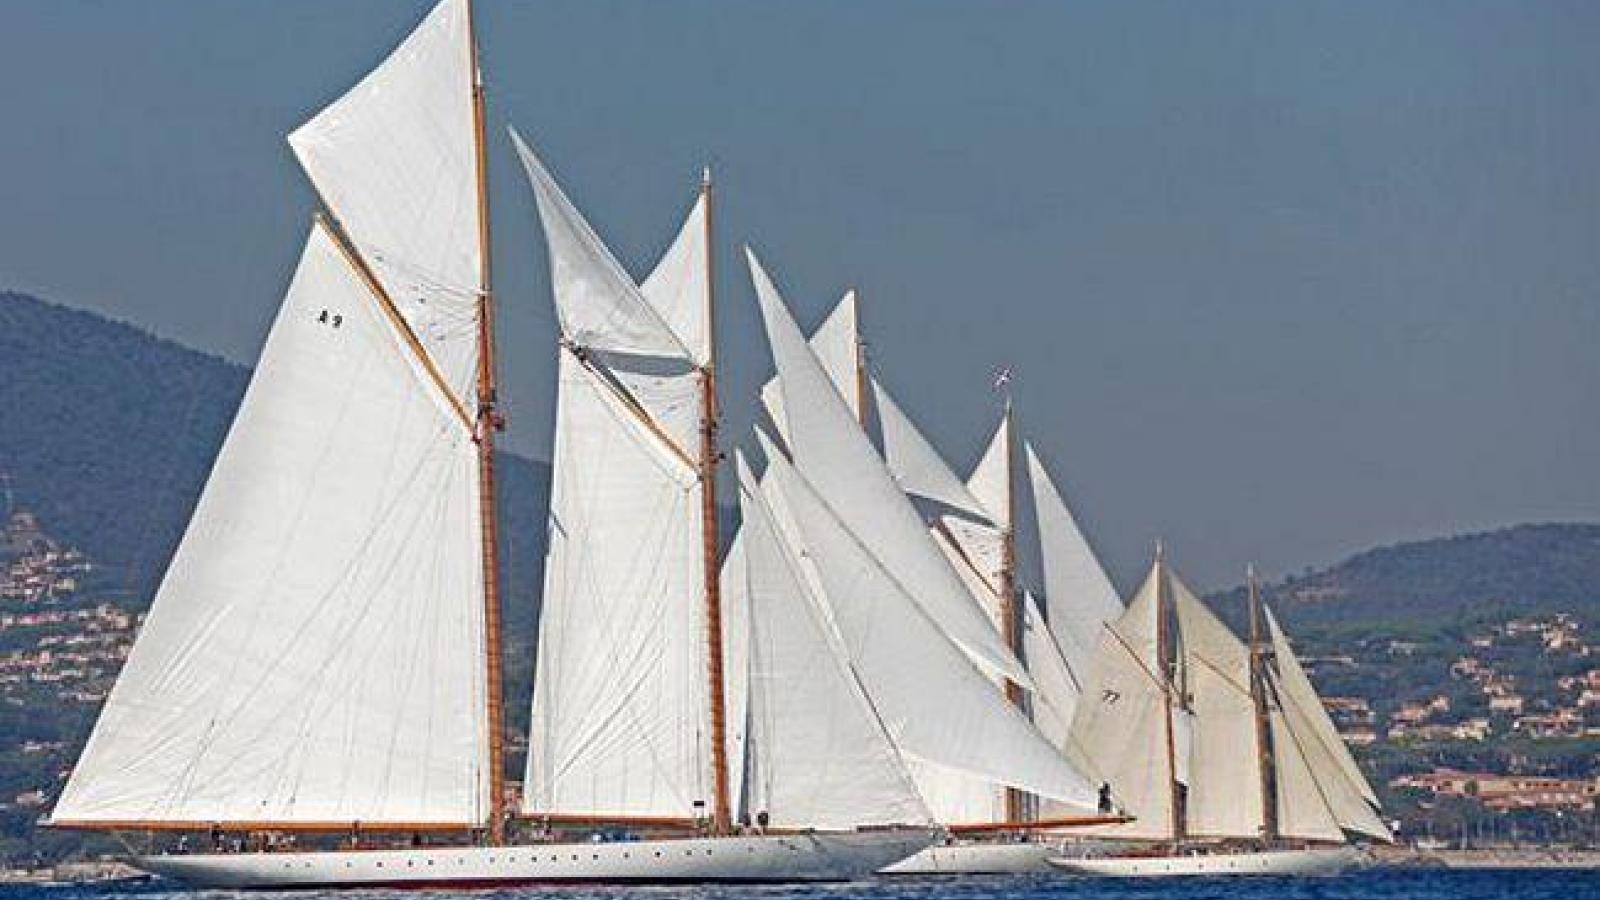 Saint Tropez sailing - a remarkable yachting event